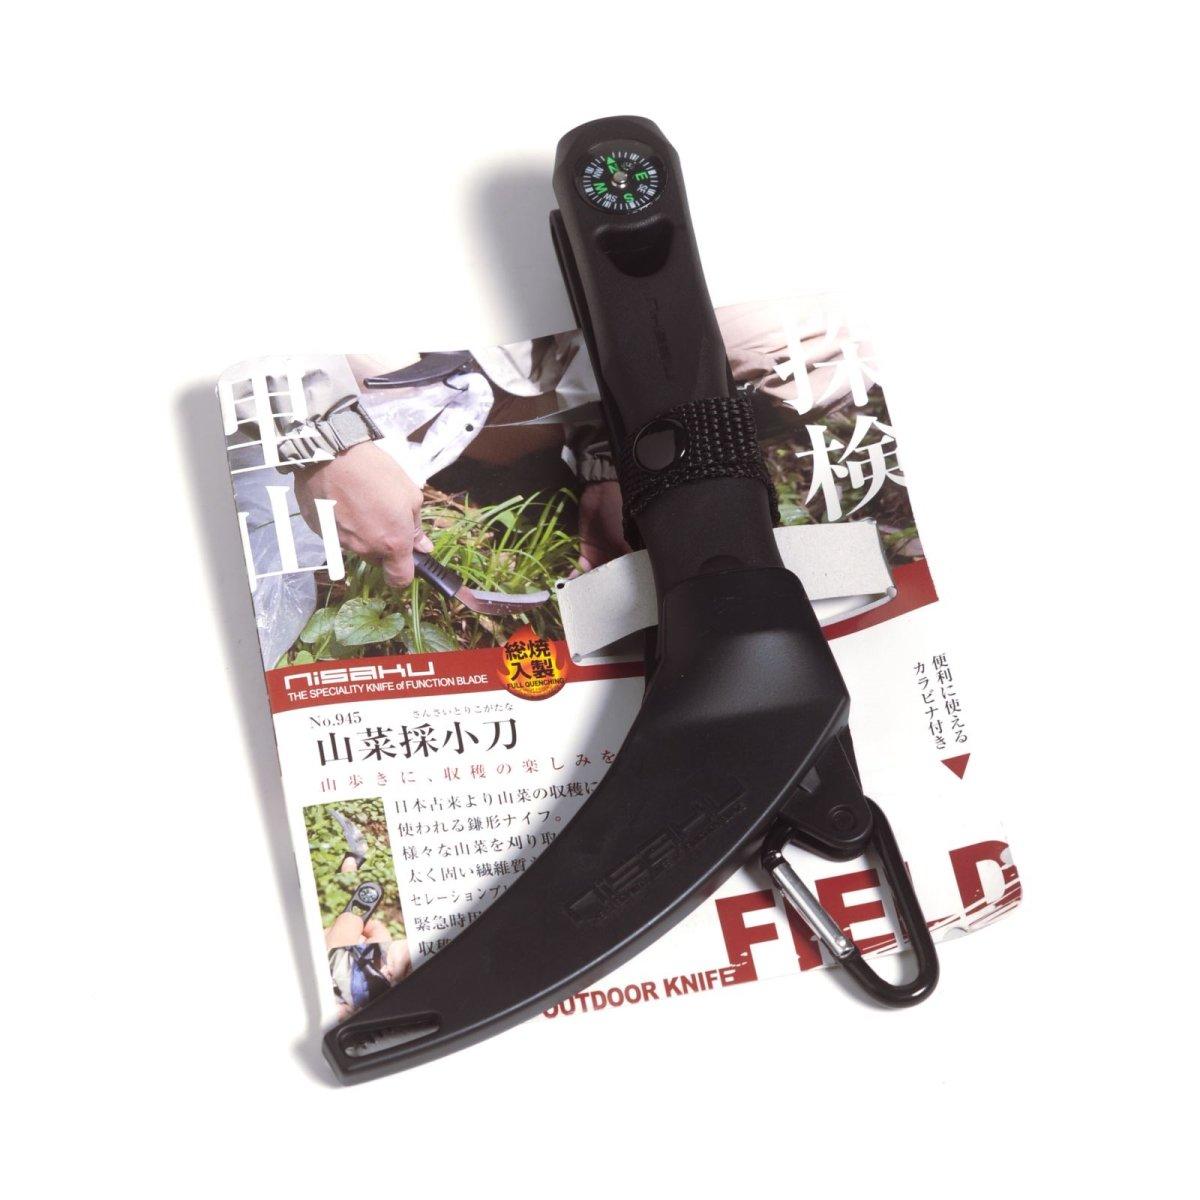 Nisaku NJP945 4.75'' Blade Sansaitorikogotana Stainless Steel Knife